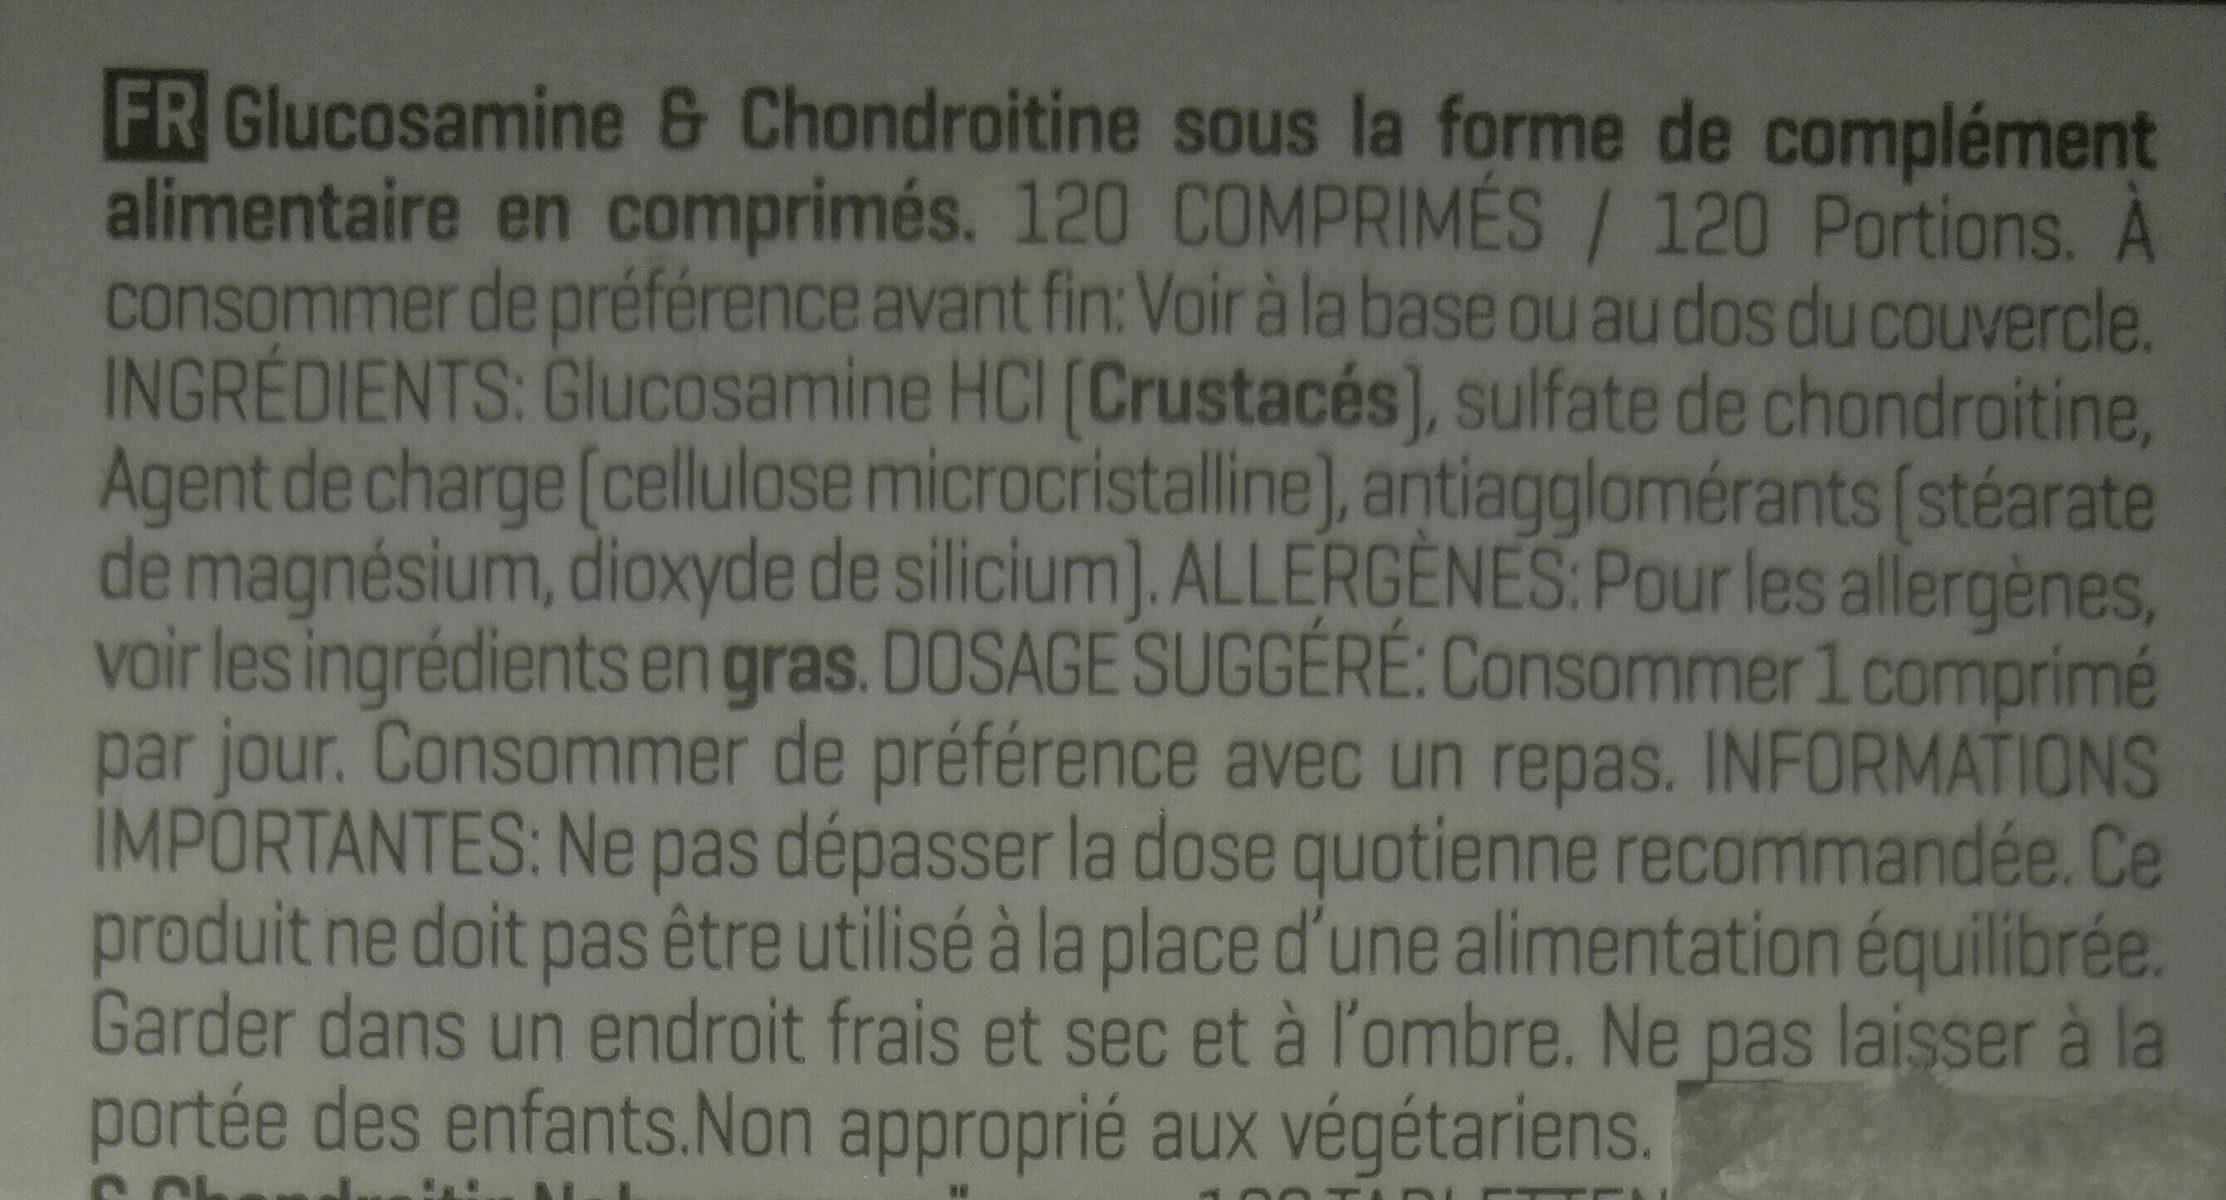 Glucosamin HCL + Chondroitin Hochdosiert, Neutral - Ingredients - fr